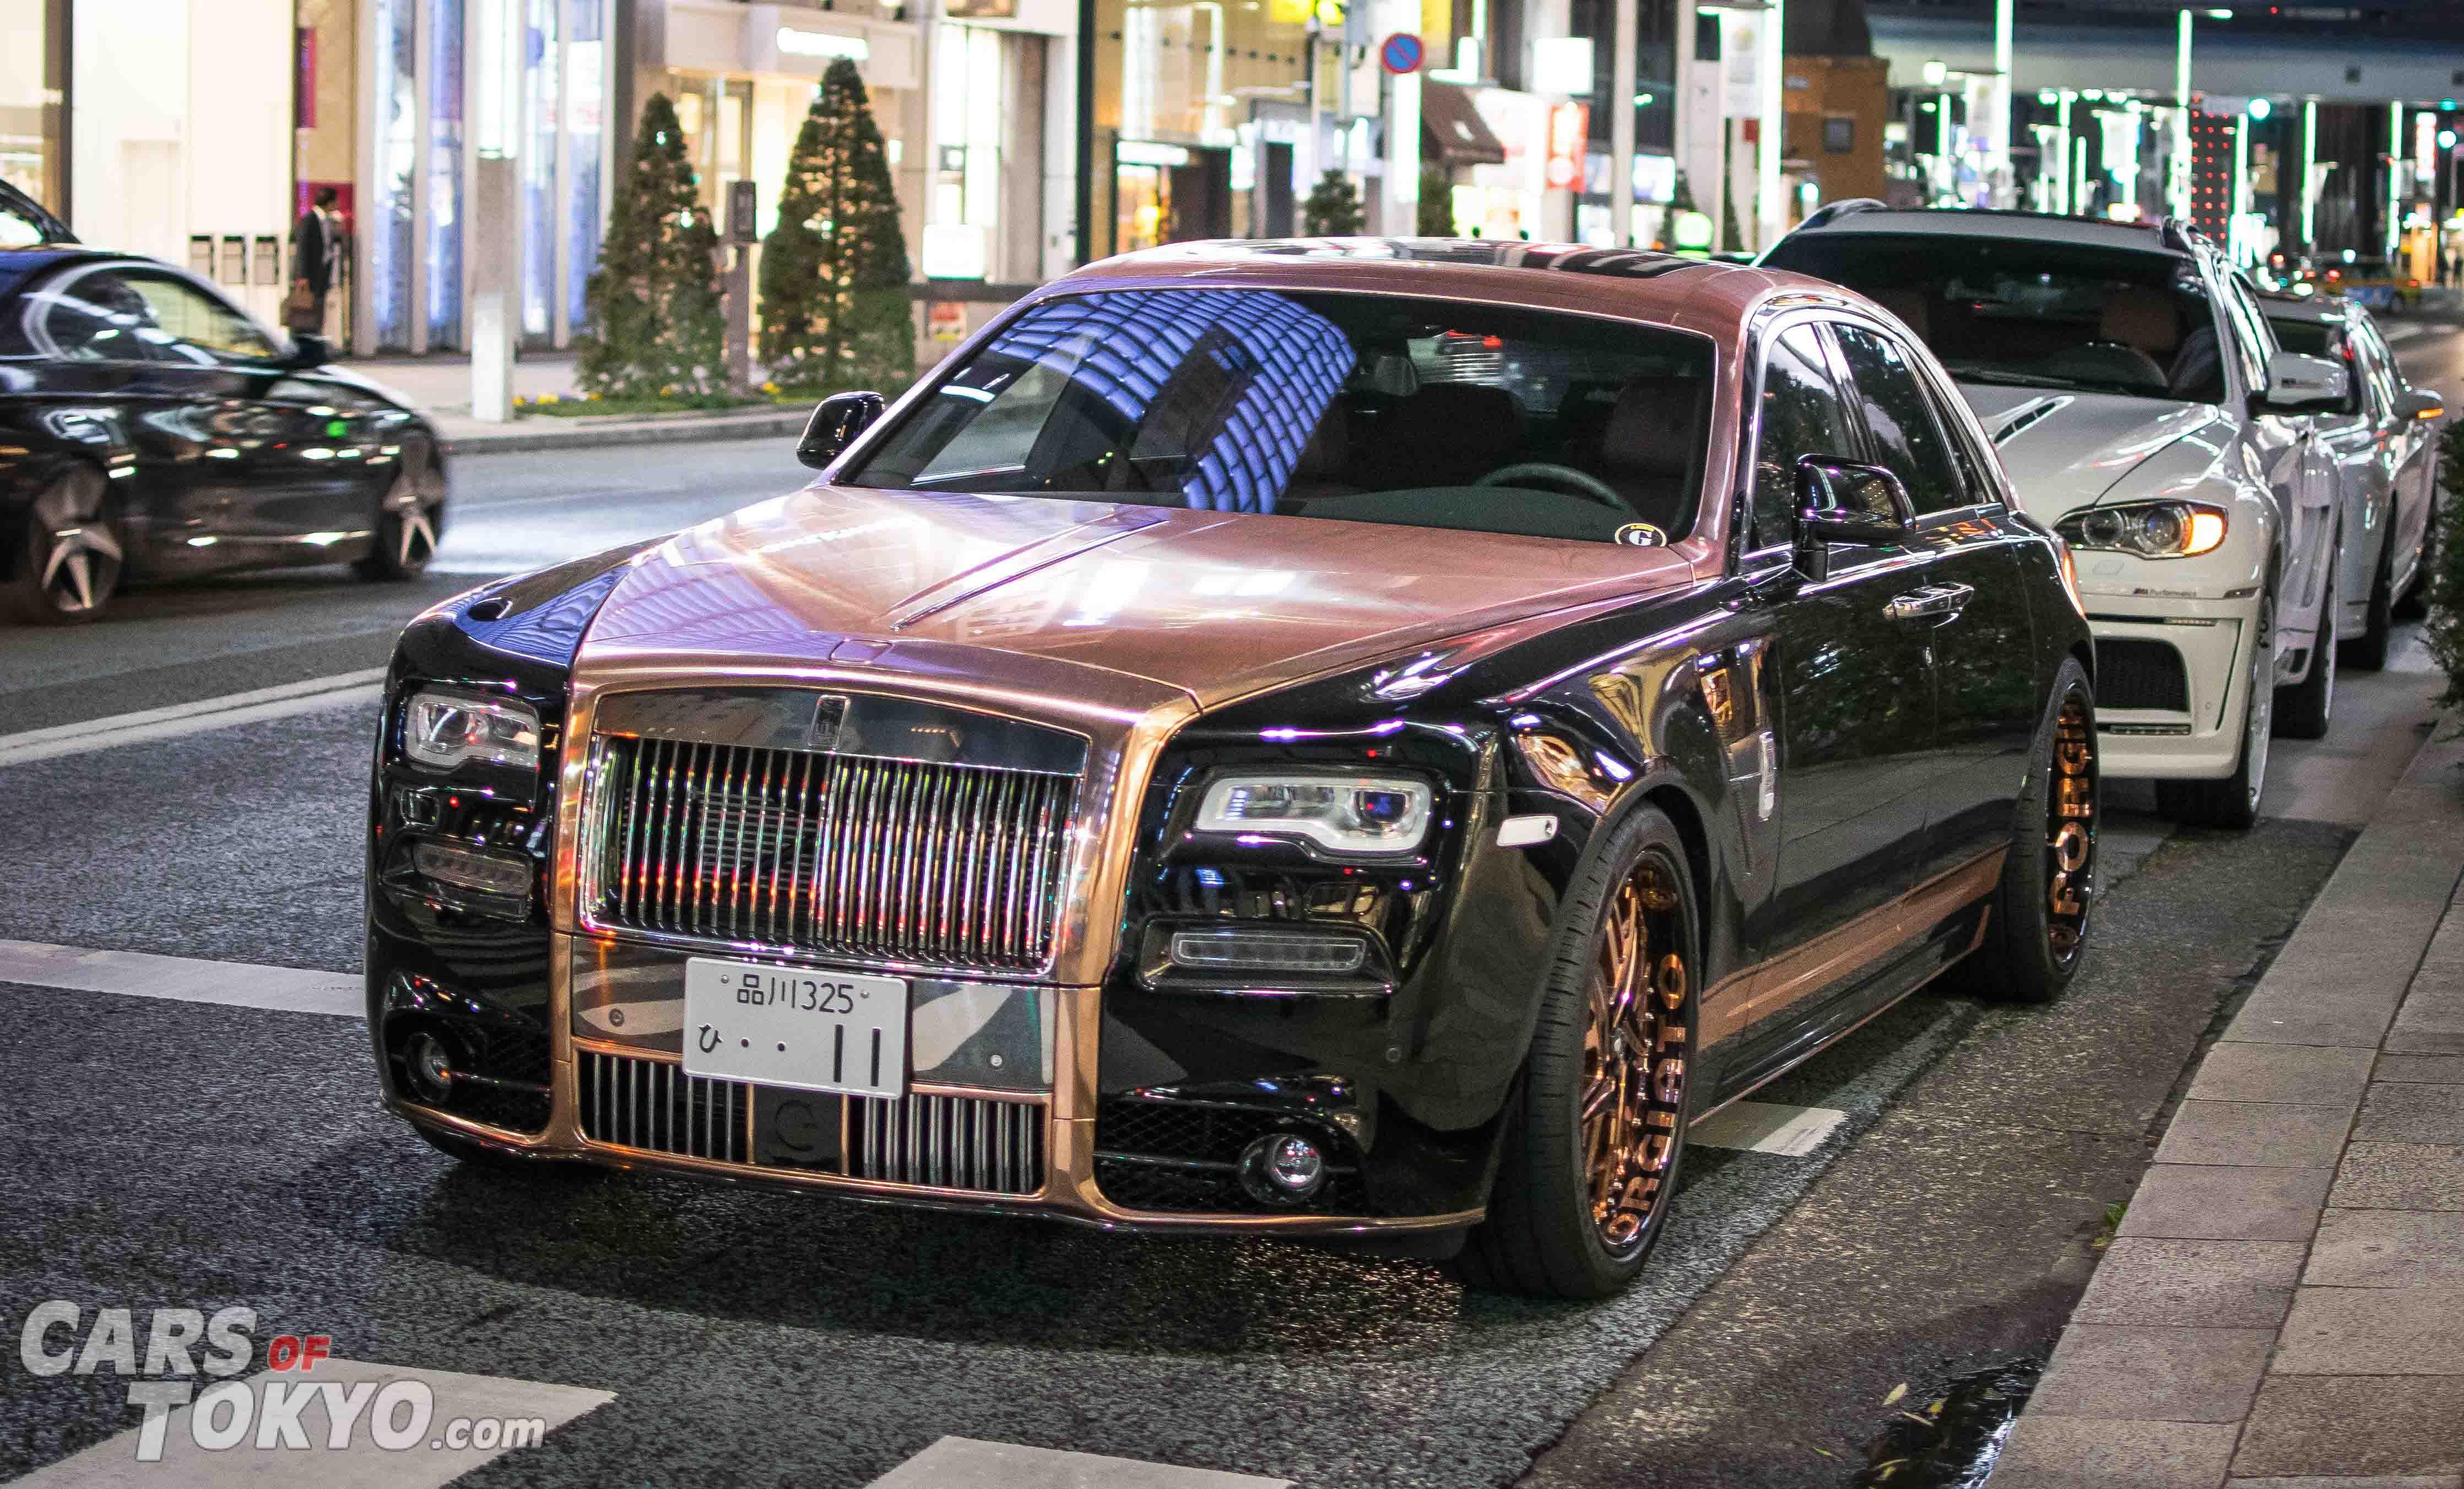 cars-of-tokyo-luxury-rolls-royce-ghost-rose-gold